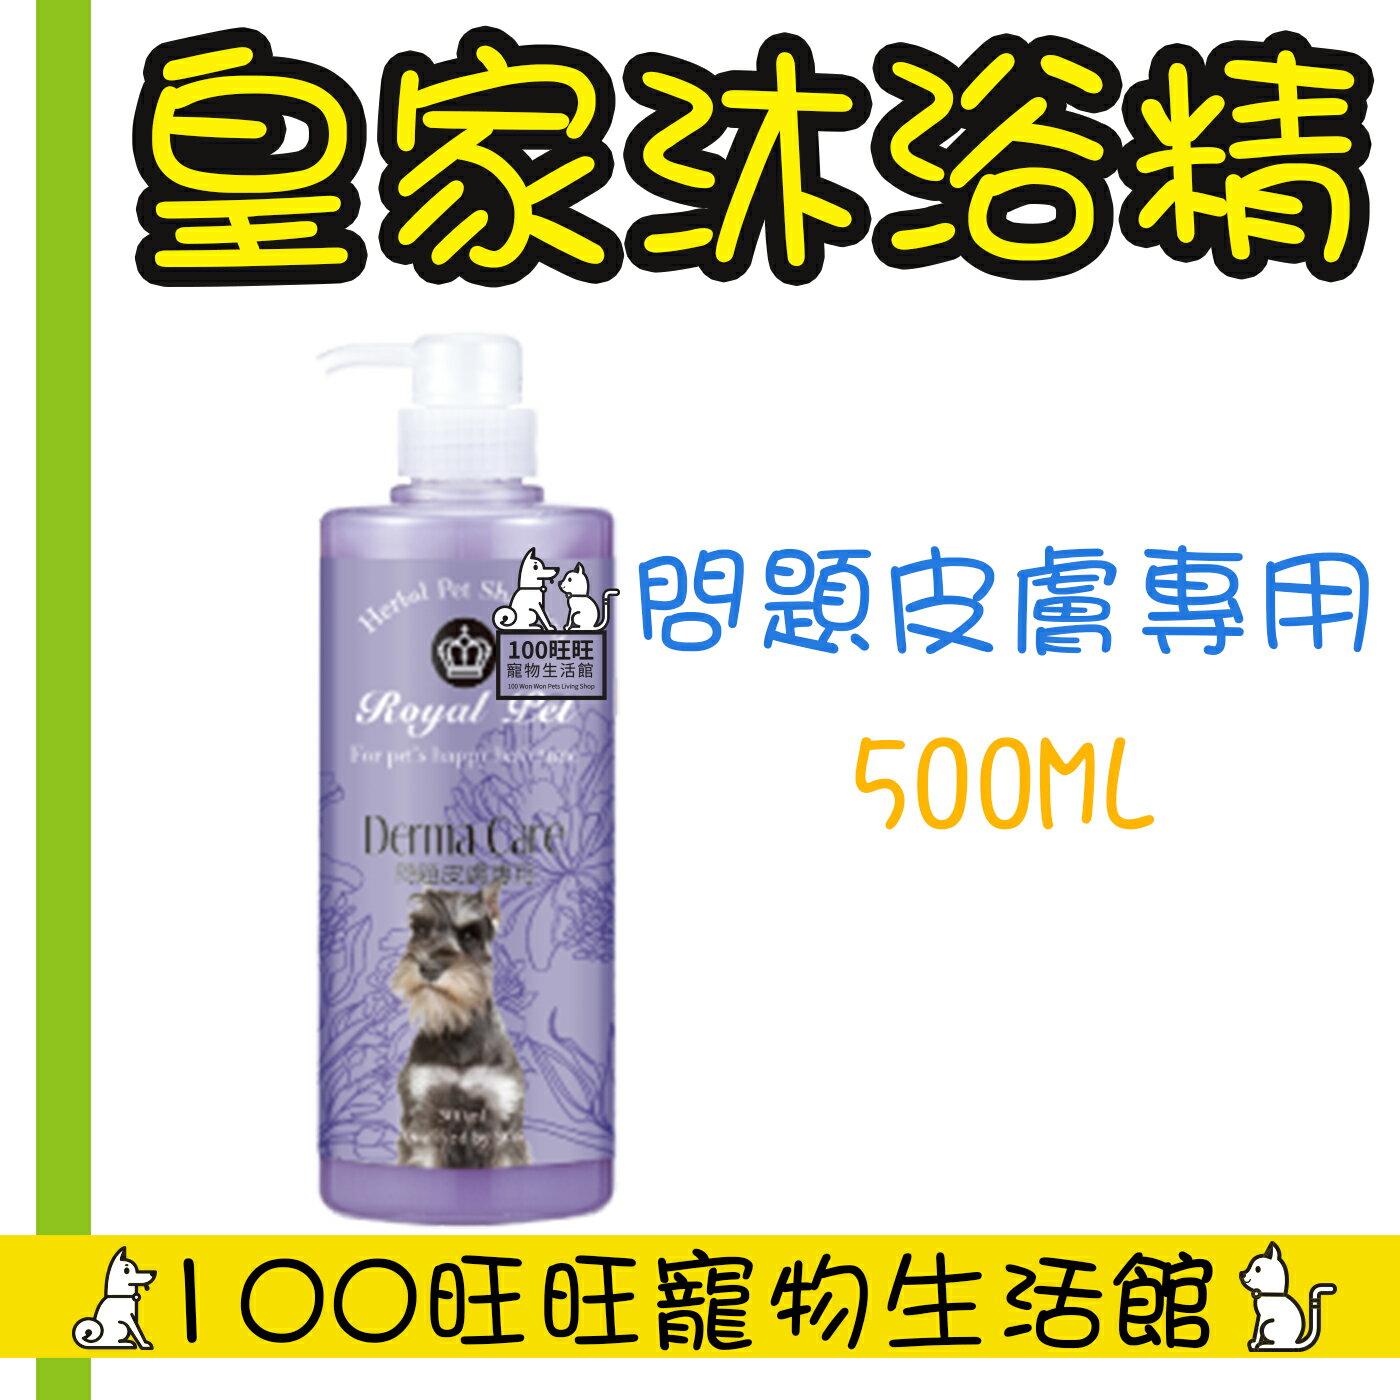 Royal Pet皇家系列 皇家沐浴精 問題皮膚專用 500ml 寵物洗毛精